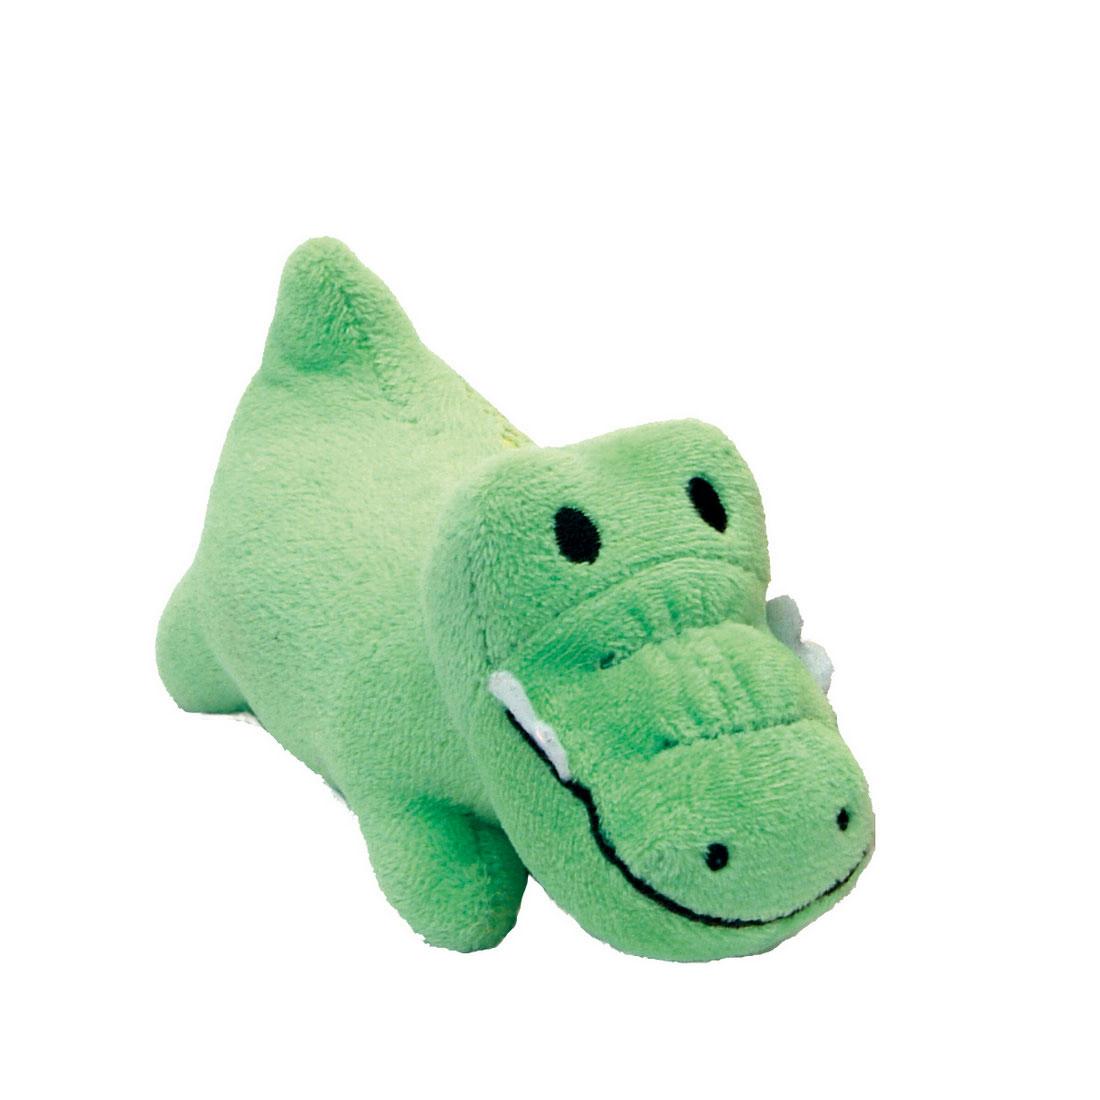 Li'l Pals Gator Plush Dog Toy, 4.5-in